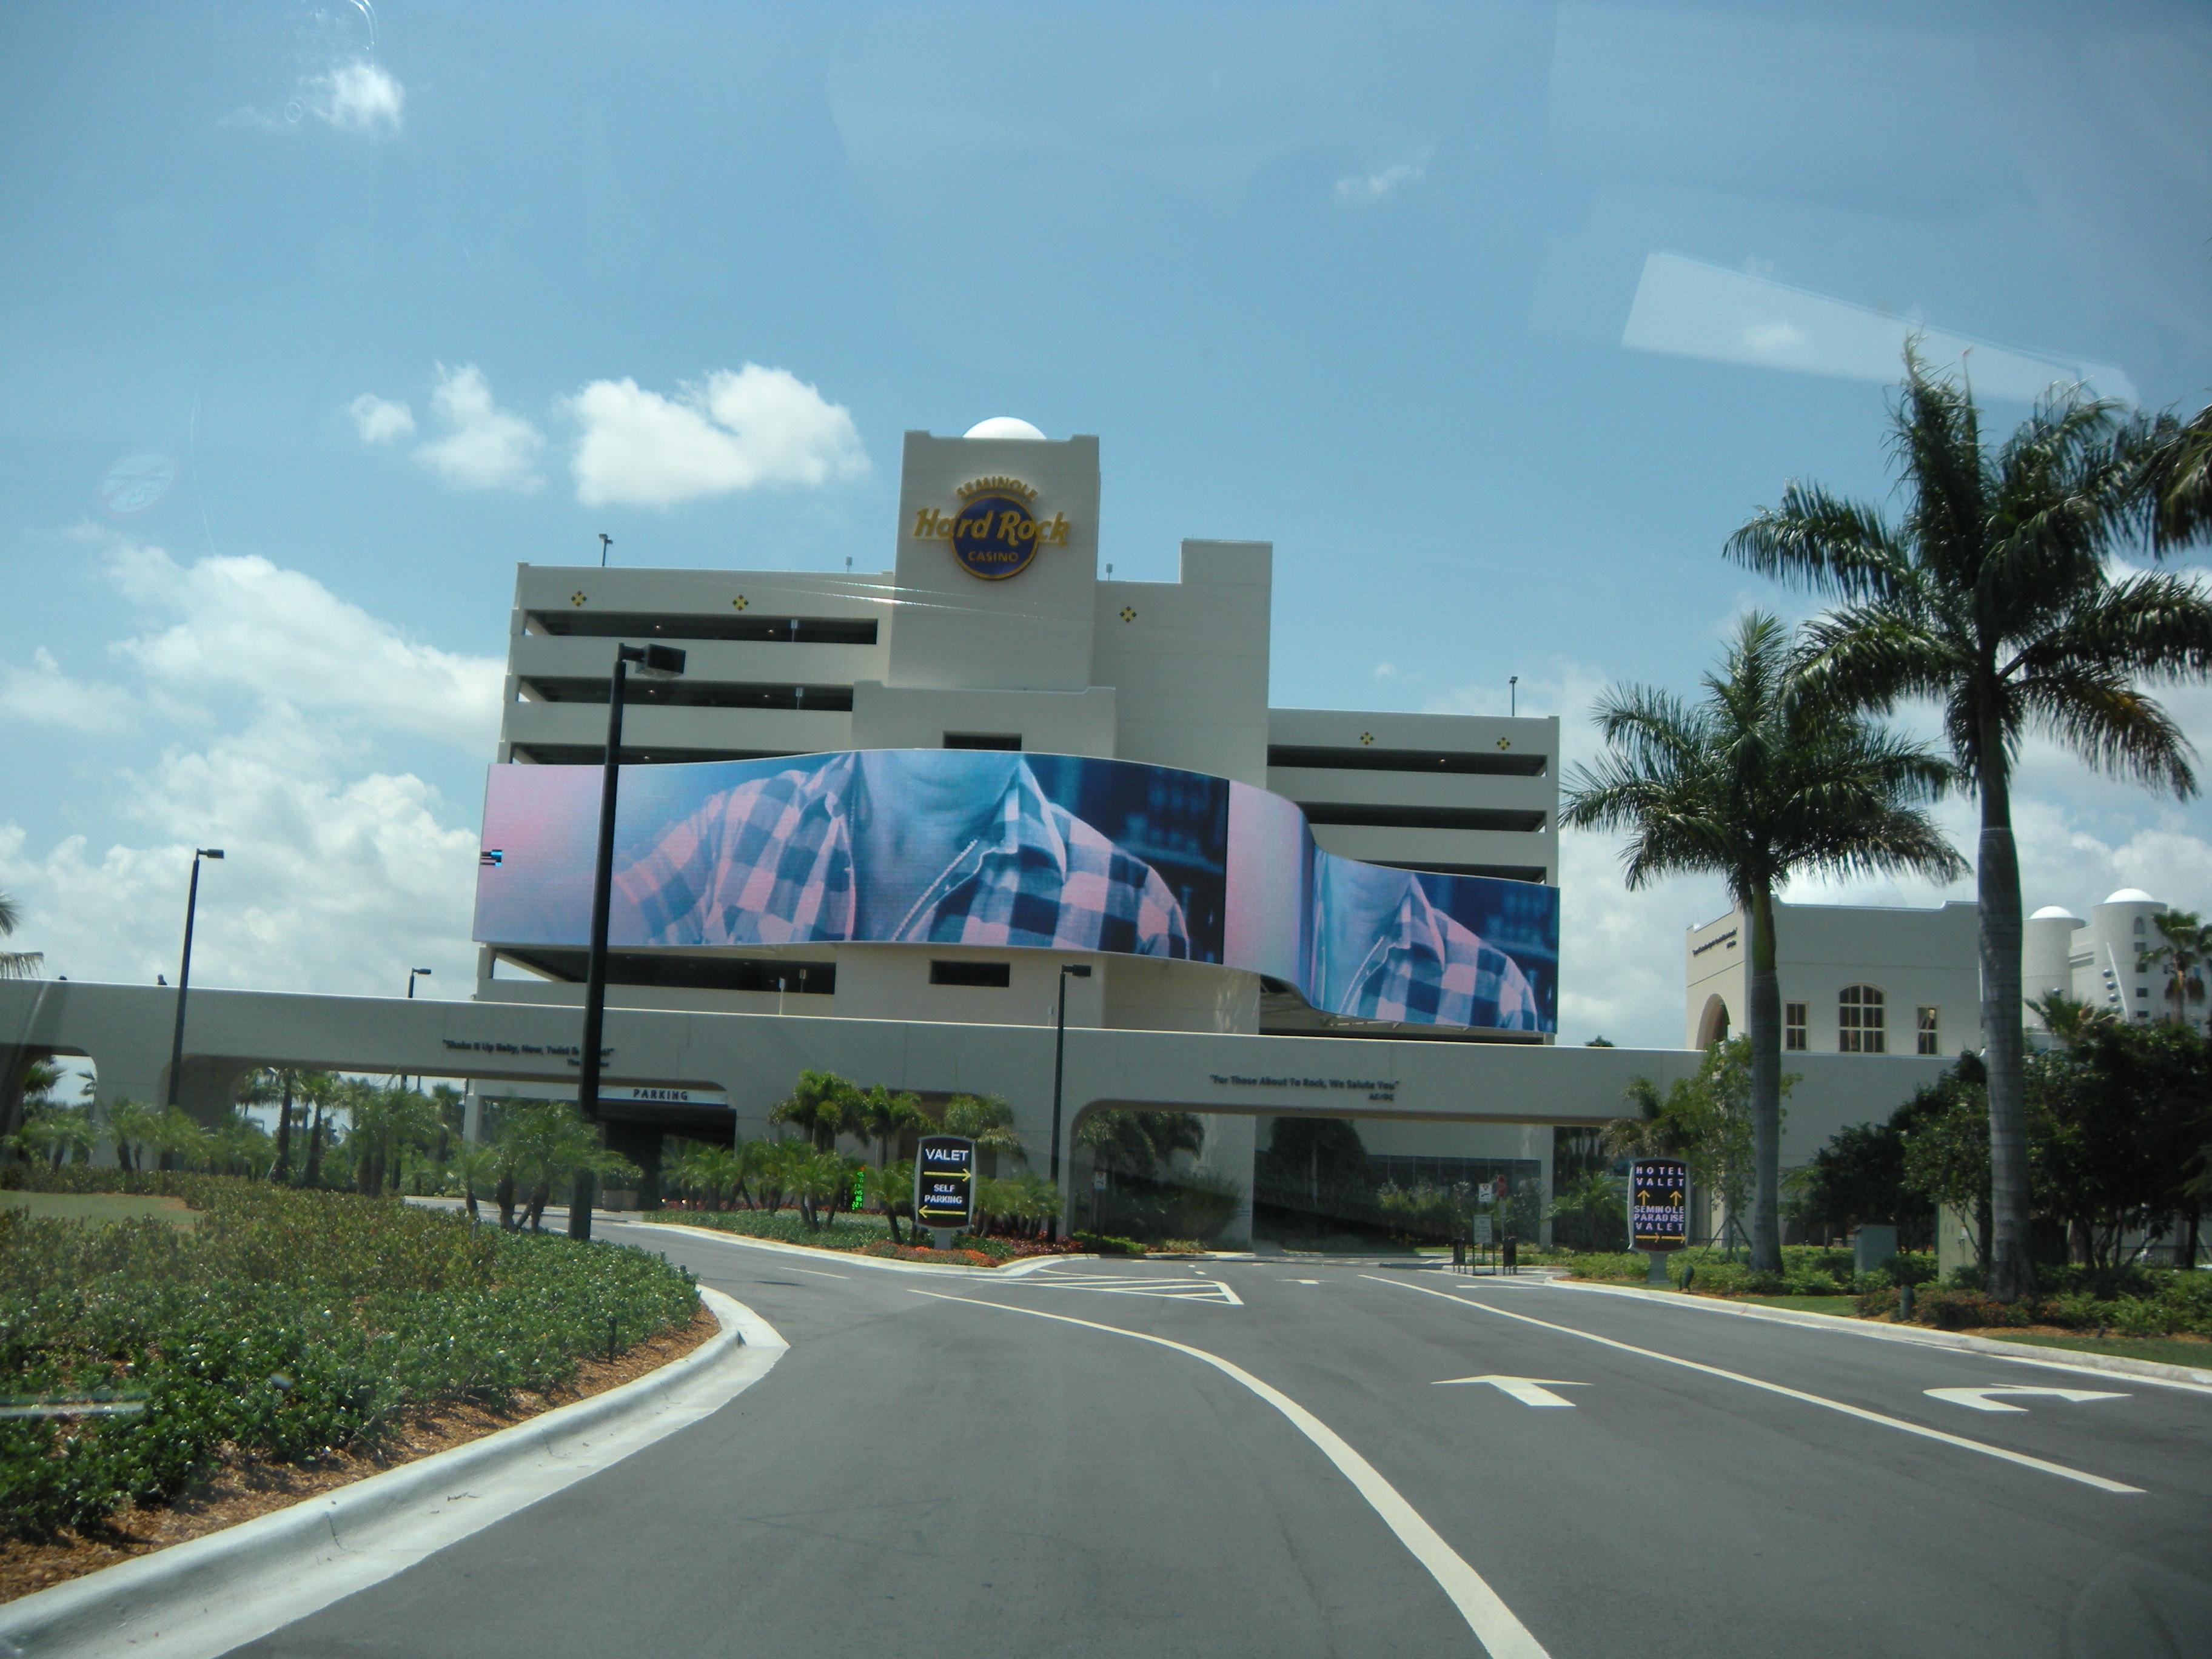 Hardrock Casino Hollywood Fl Map Seminole Hard Rock Hotel And Casino - Map Of Hotels In Hollywood Florida